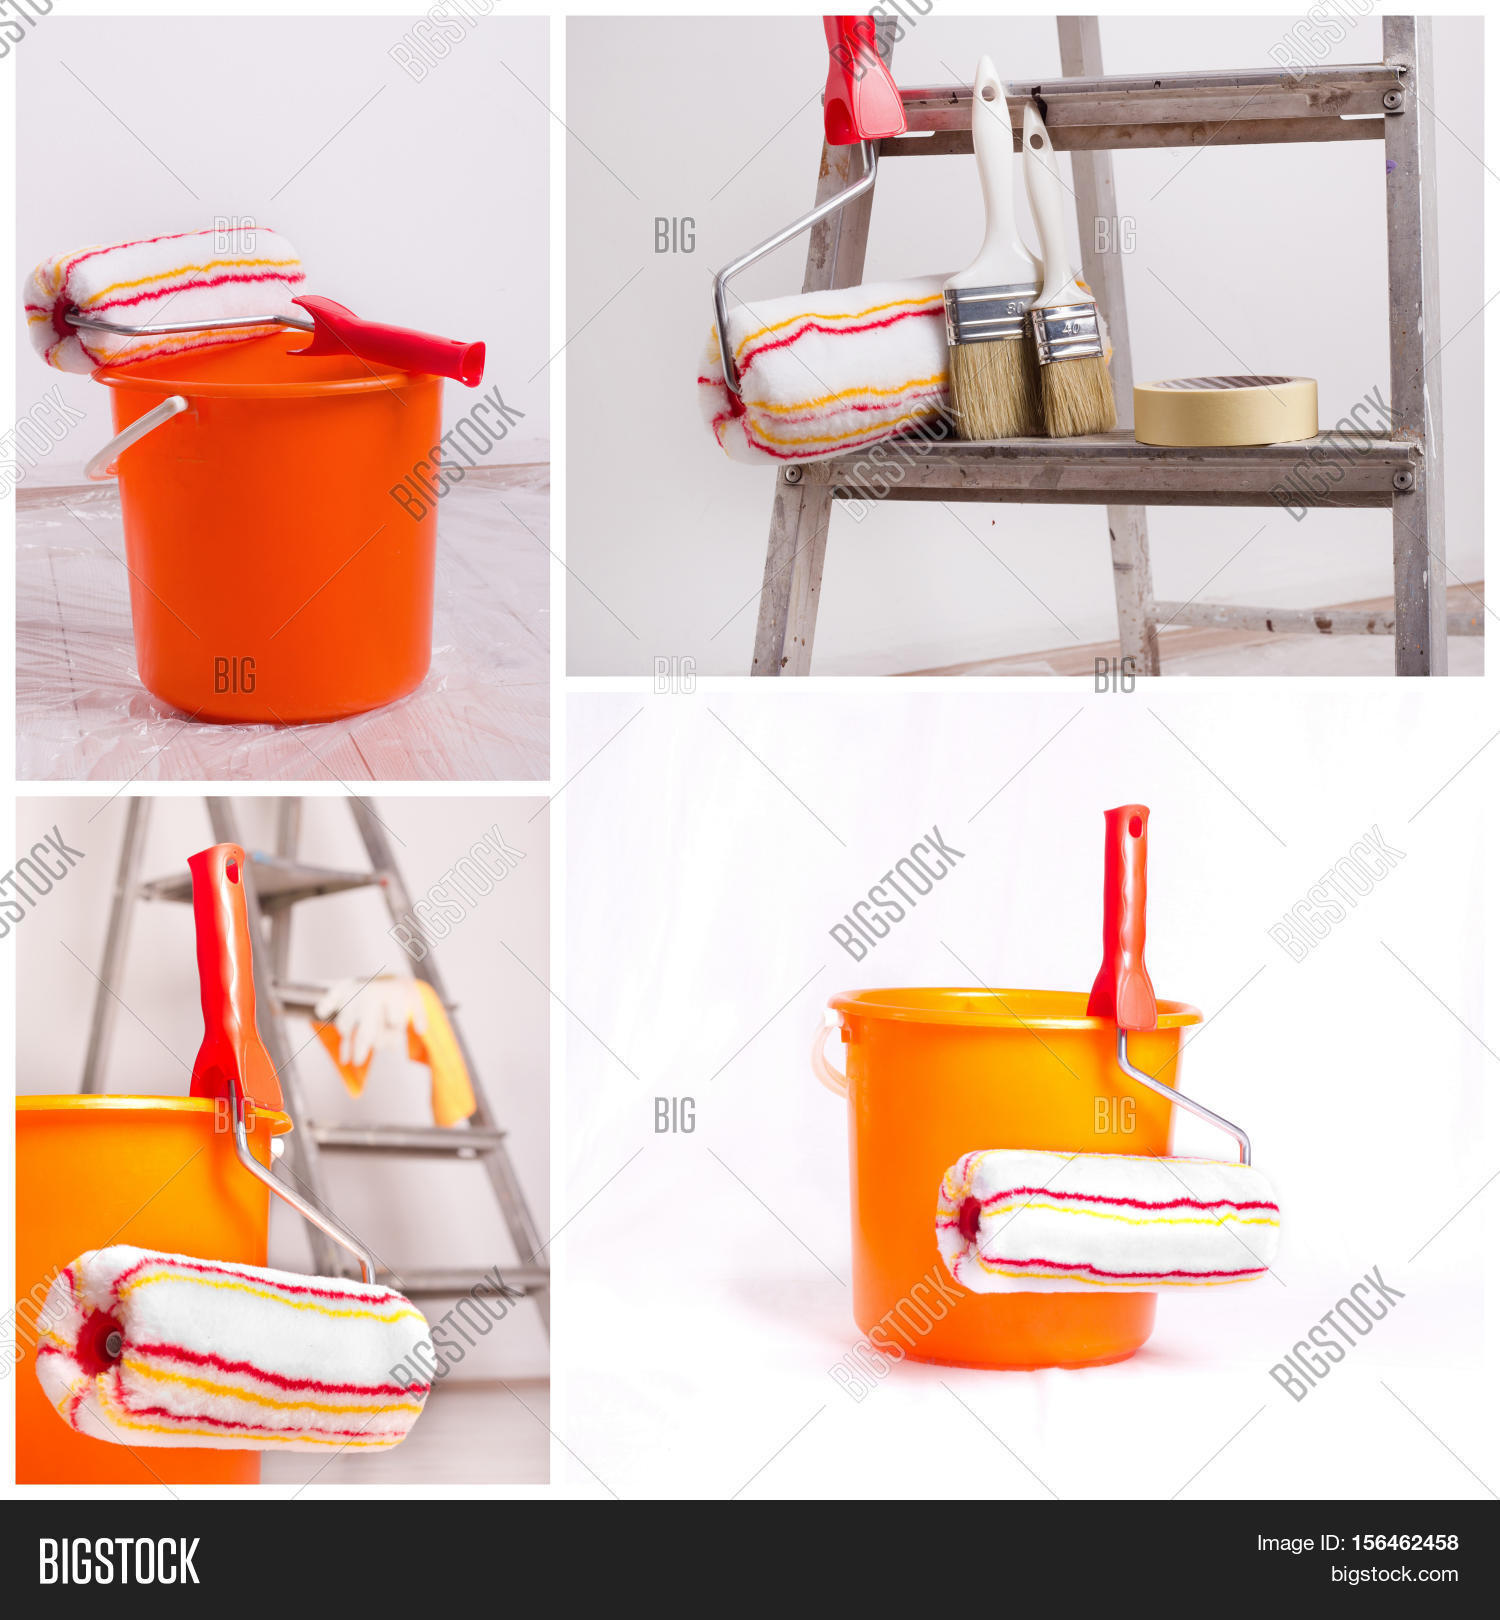 Wall Painting Equipment : Wall painting equipment image photo bigstock